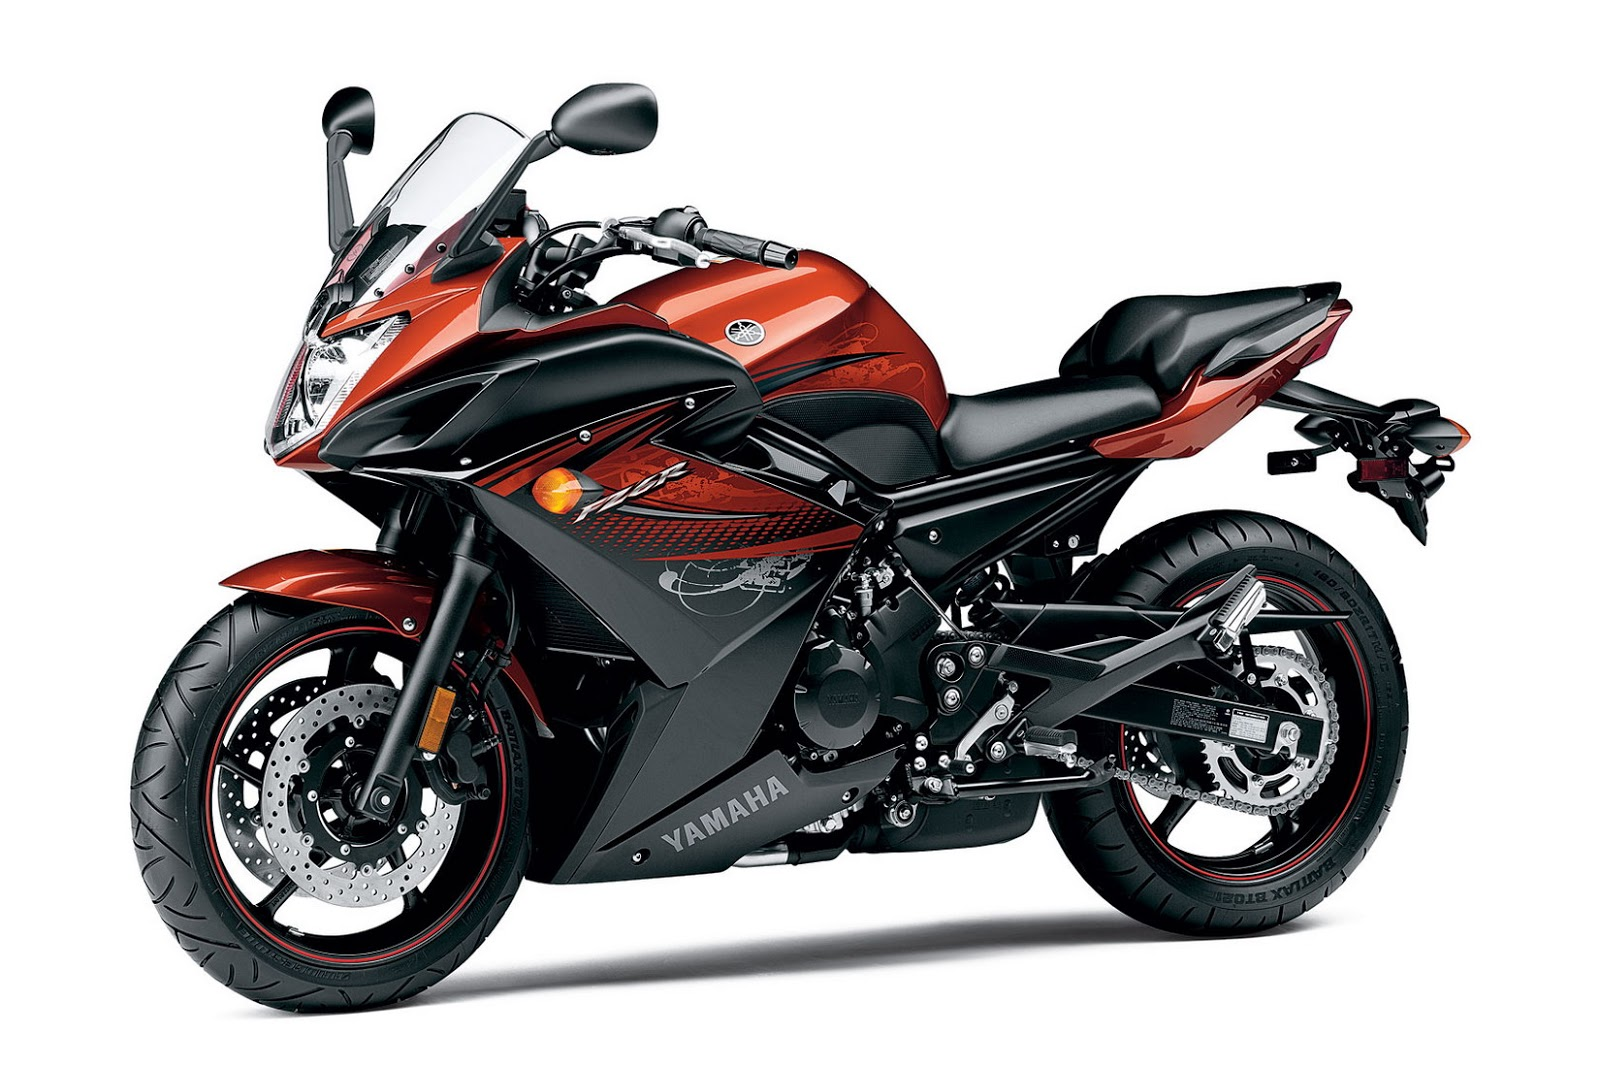 2011 yamaha fz6 r new motorcycle for Yamaha fz 6